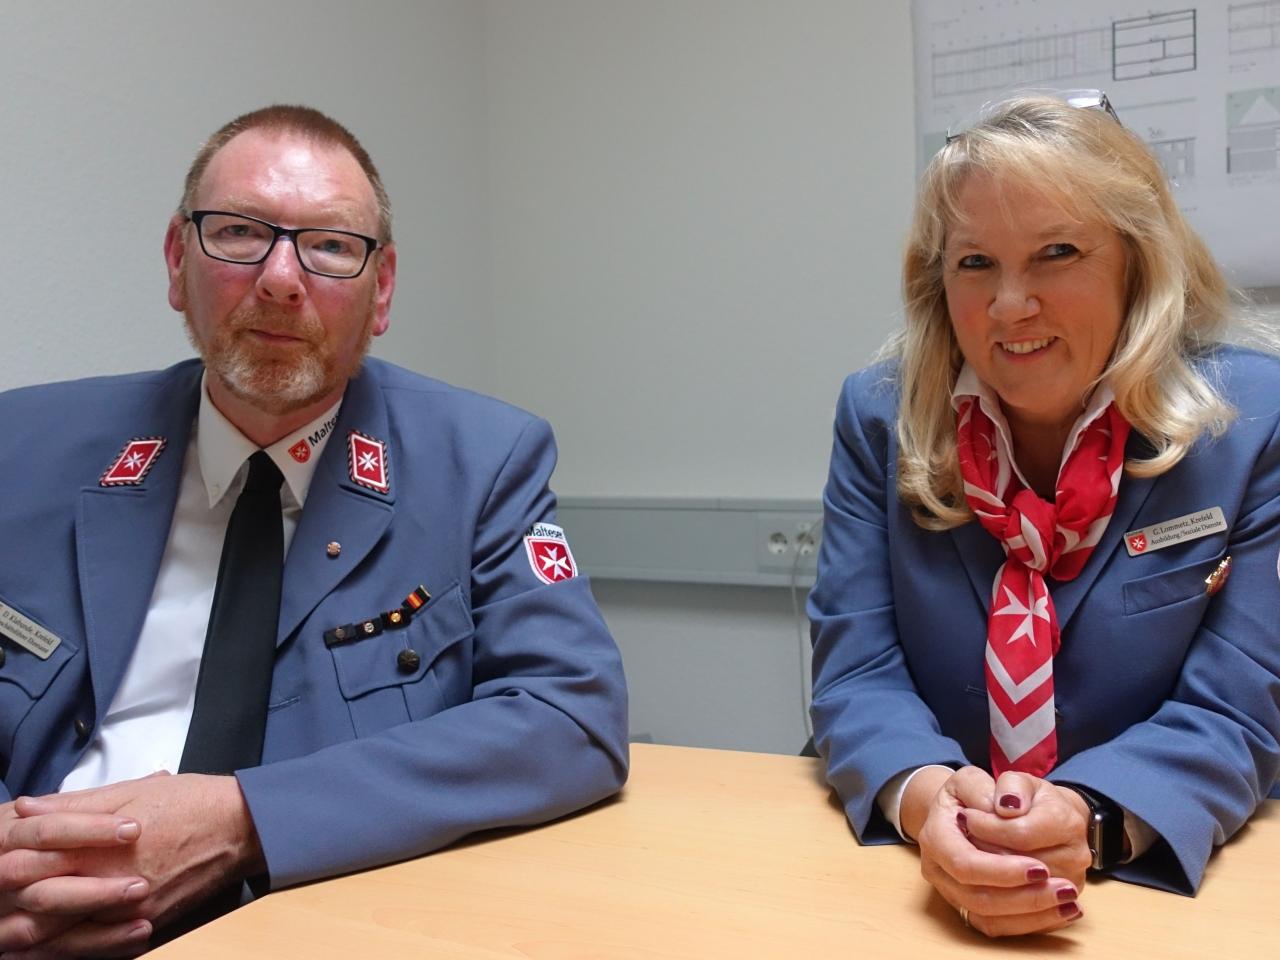 Gabi Lommetz und Dietmar Klabunde vom Malteser Hilfsdienst e.V. Krefeld